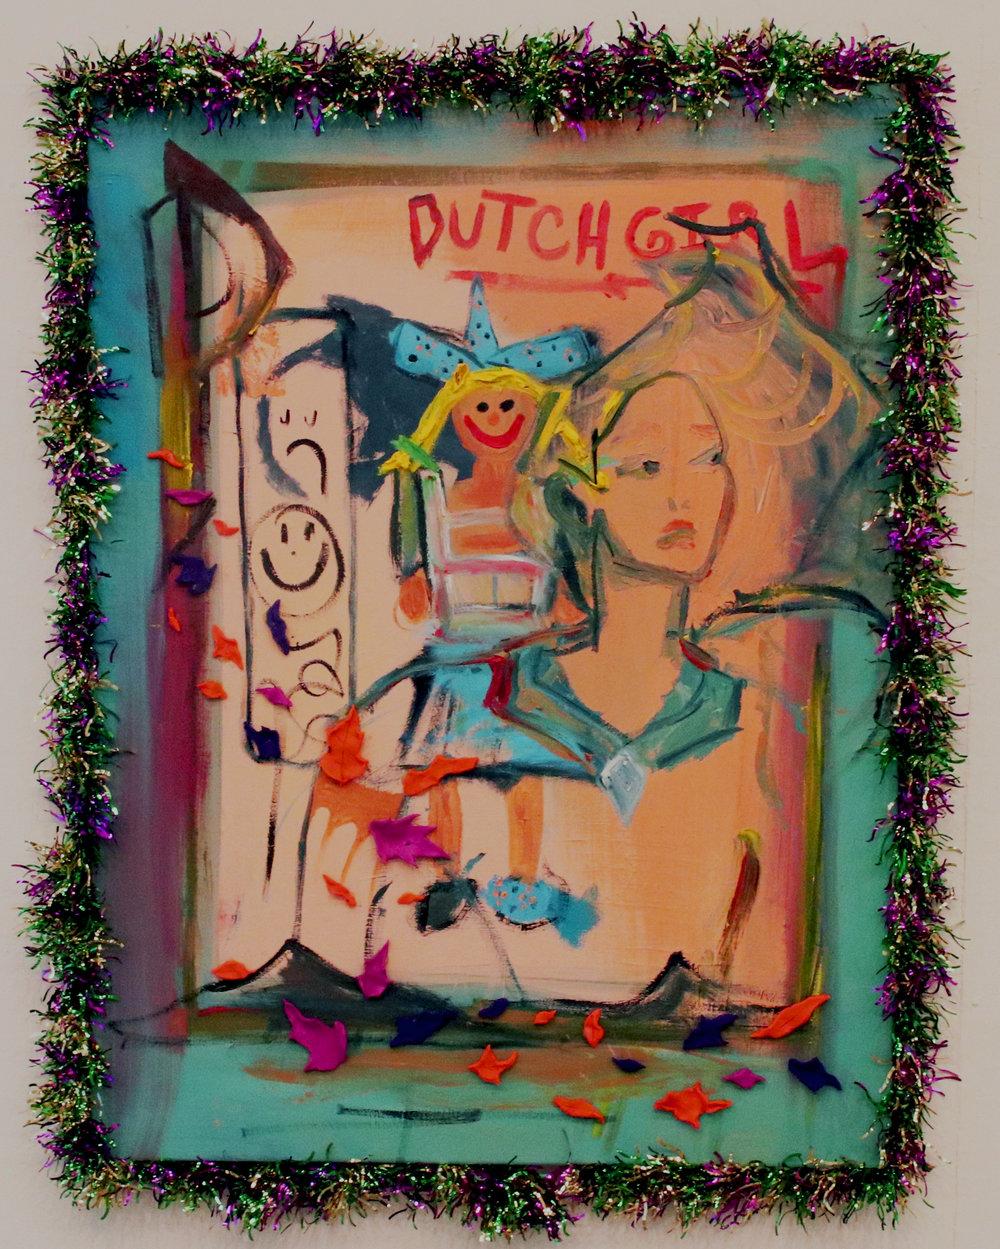 Black_Dutch_Capstone_2017.jpg